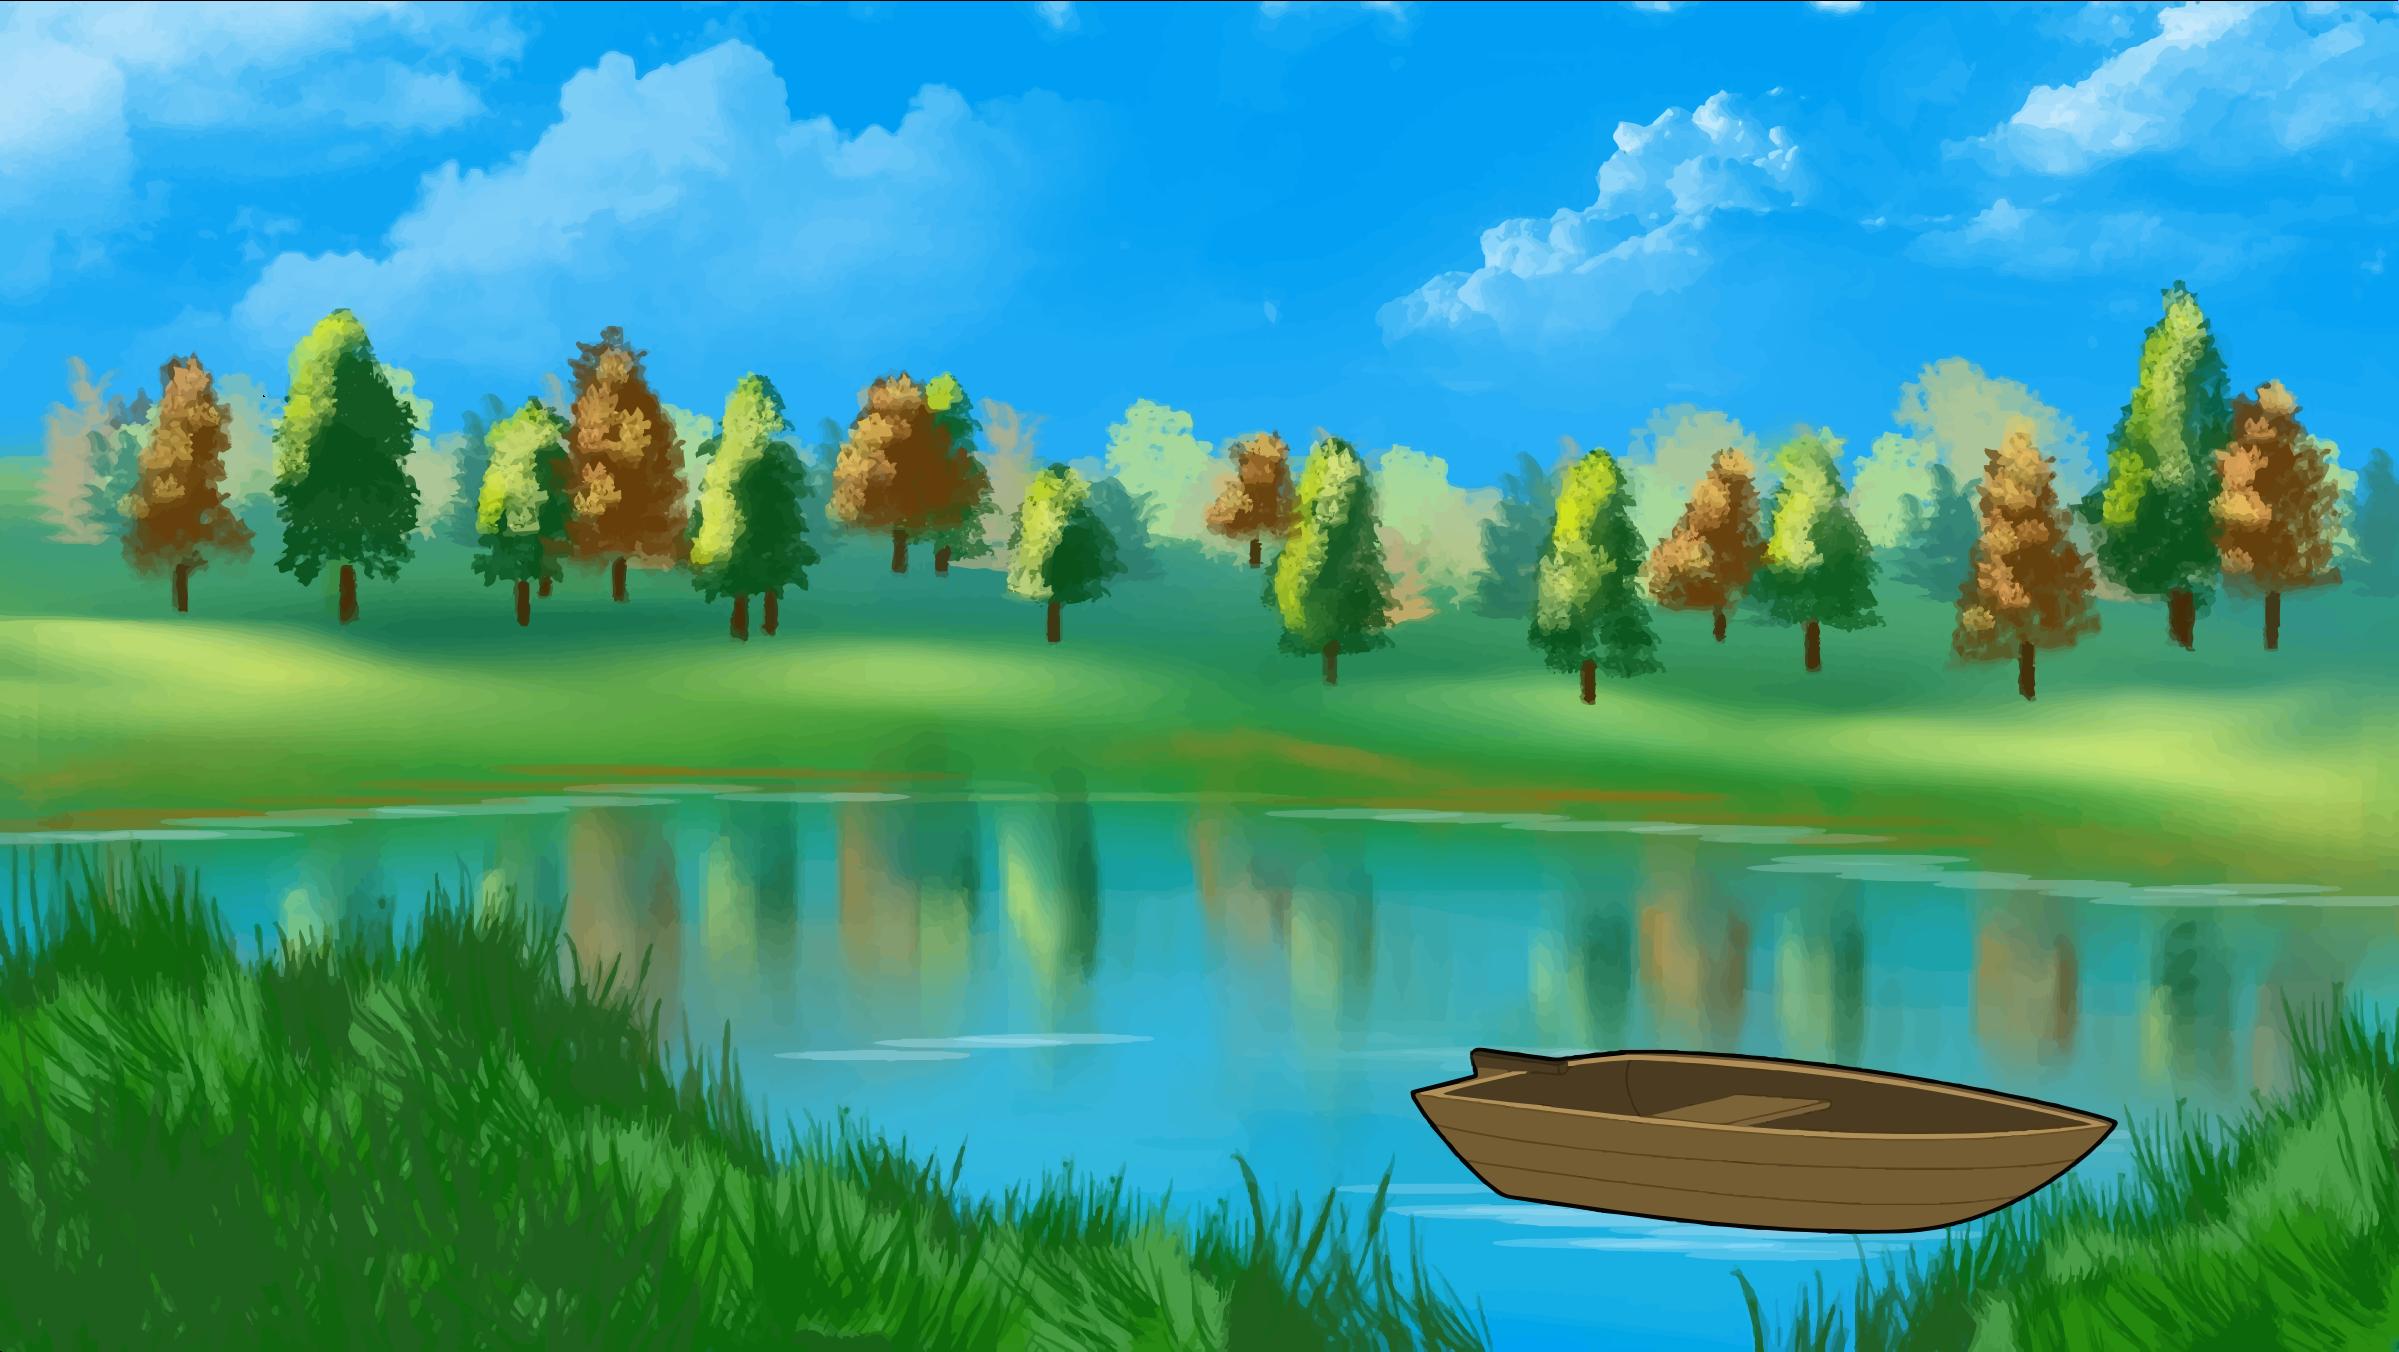 Pond clipart 2 clipart